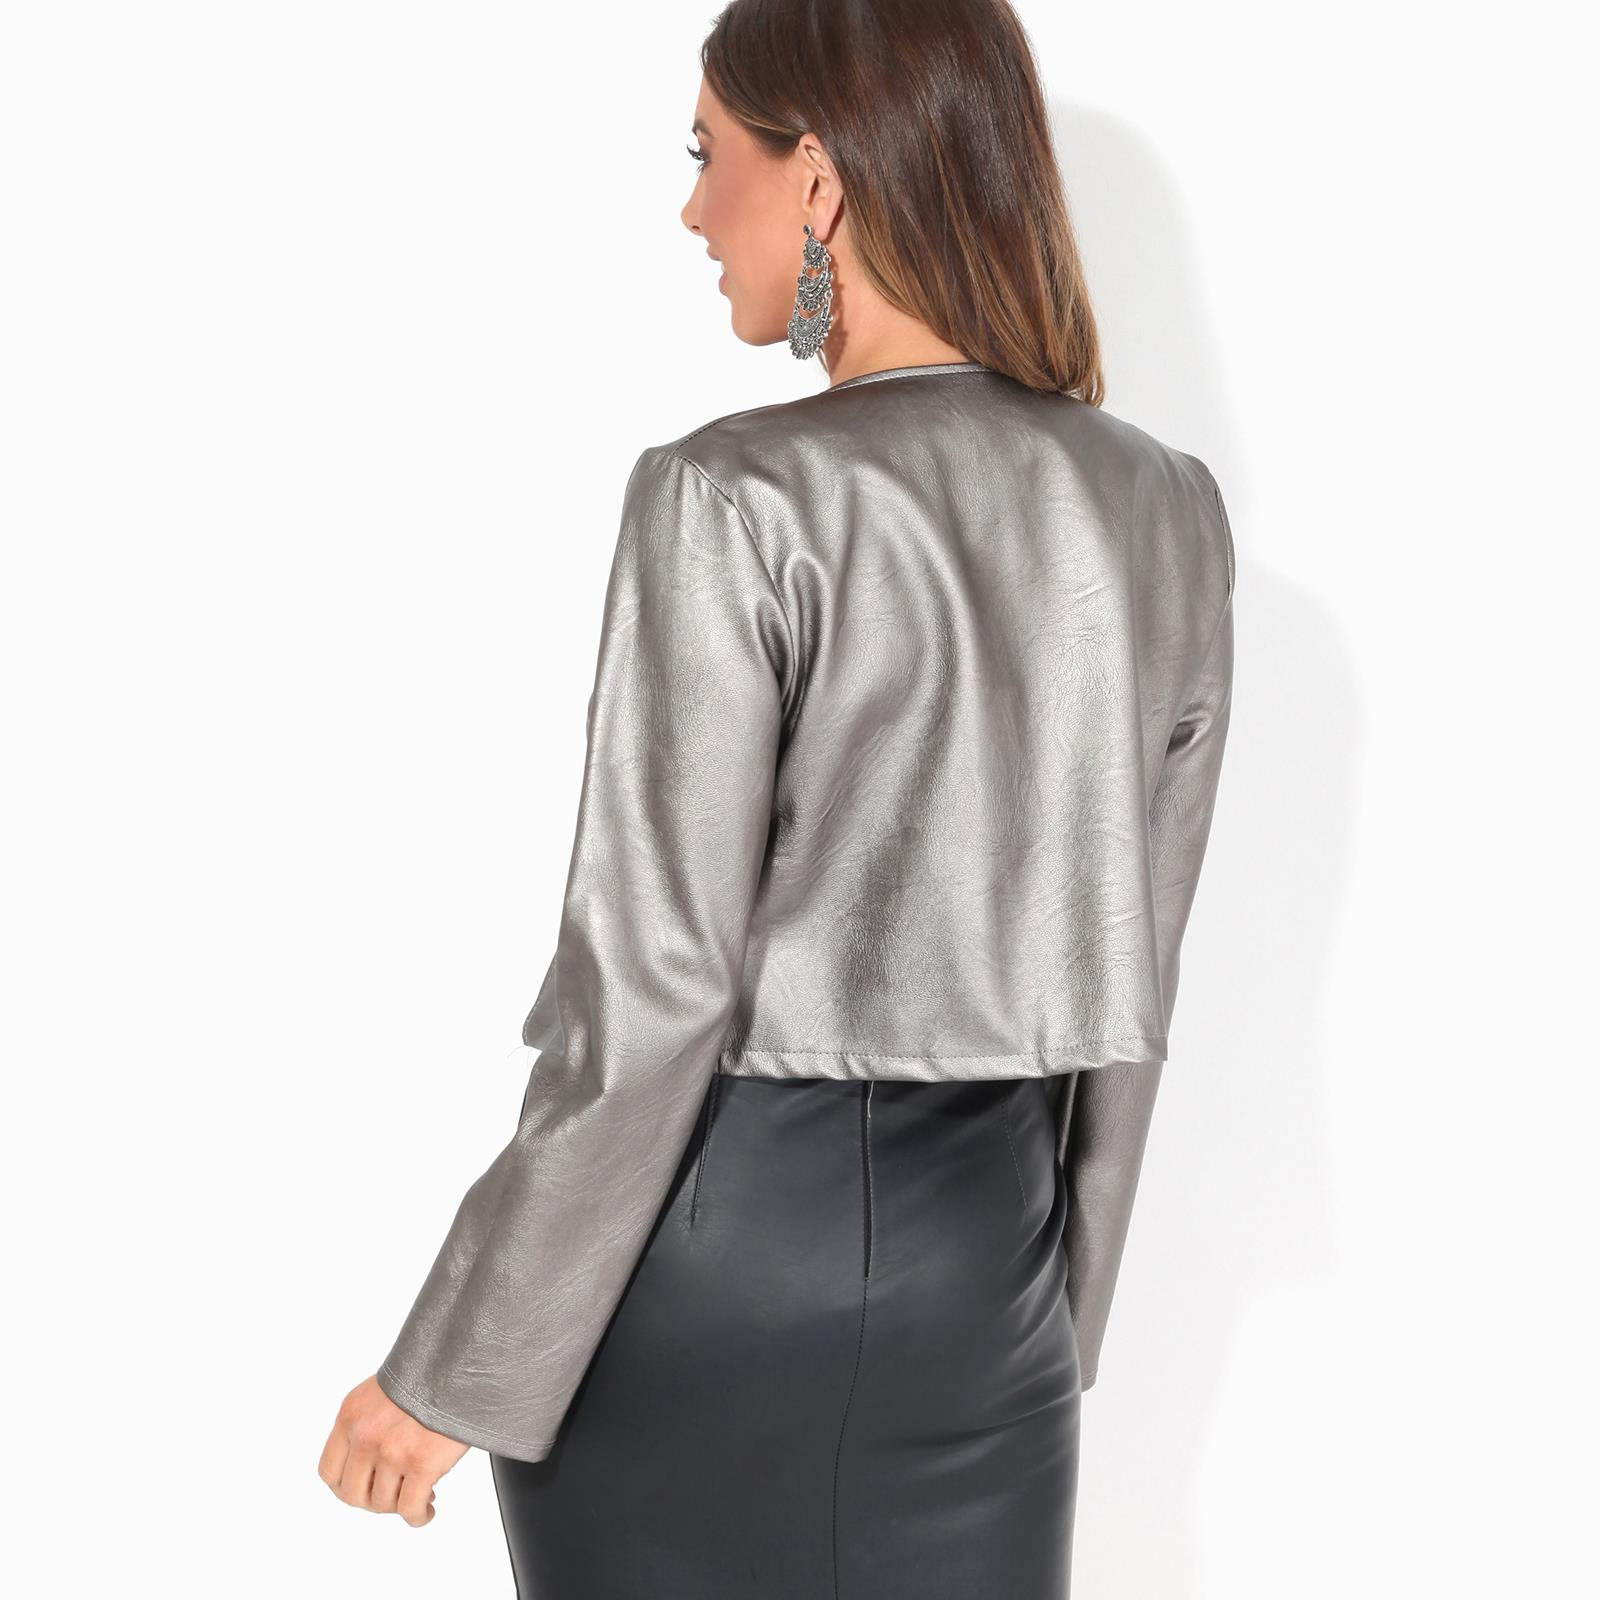 Womens-Ladies-PU-Leather-Biker-Jacket-Open-Bolero-Short-Coat-Shrug-Cropped-Top thumbnail 5